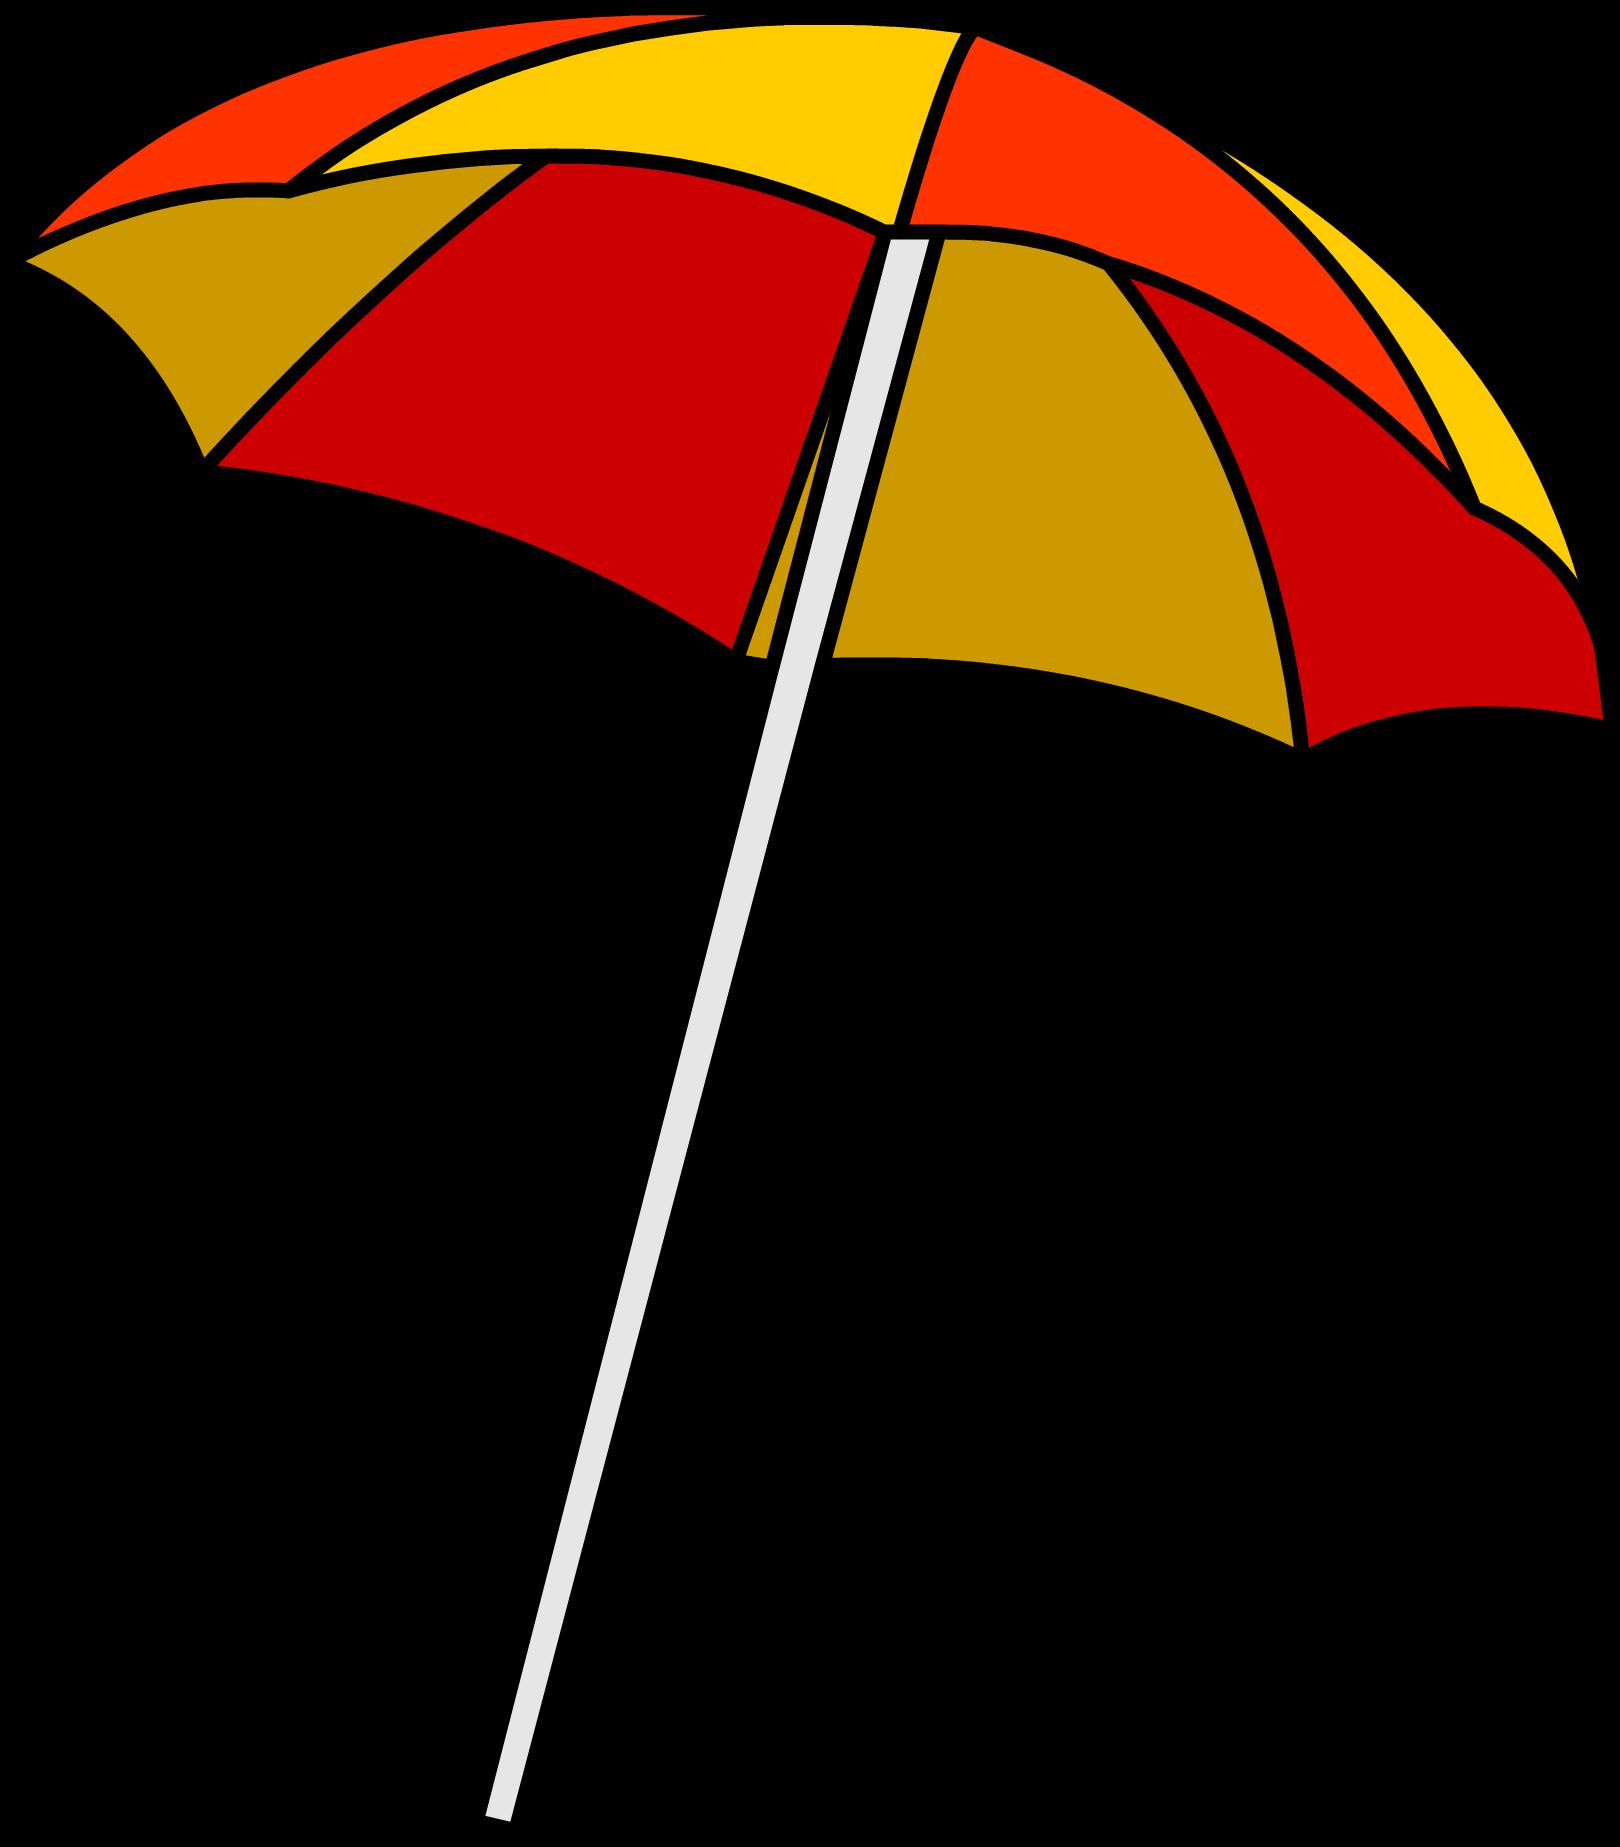 beach umbrella club penguin wiki fandom powered by wikia rh clubpenguin wikia com Cartoon Beach Scene cartoon beach umbrella images